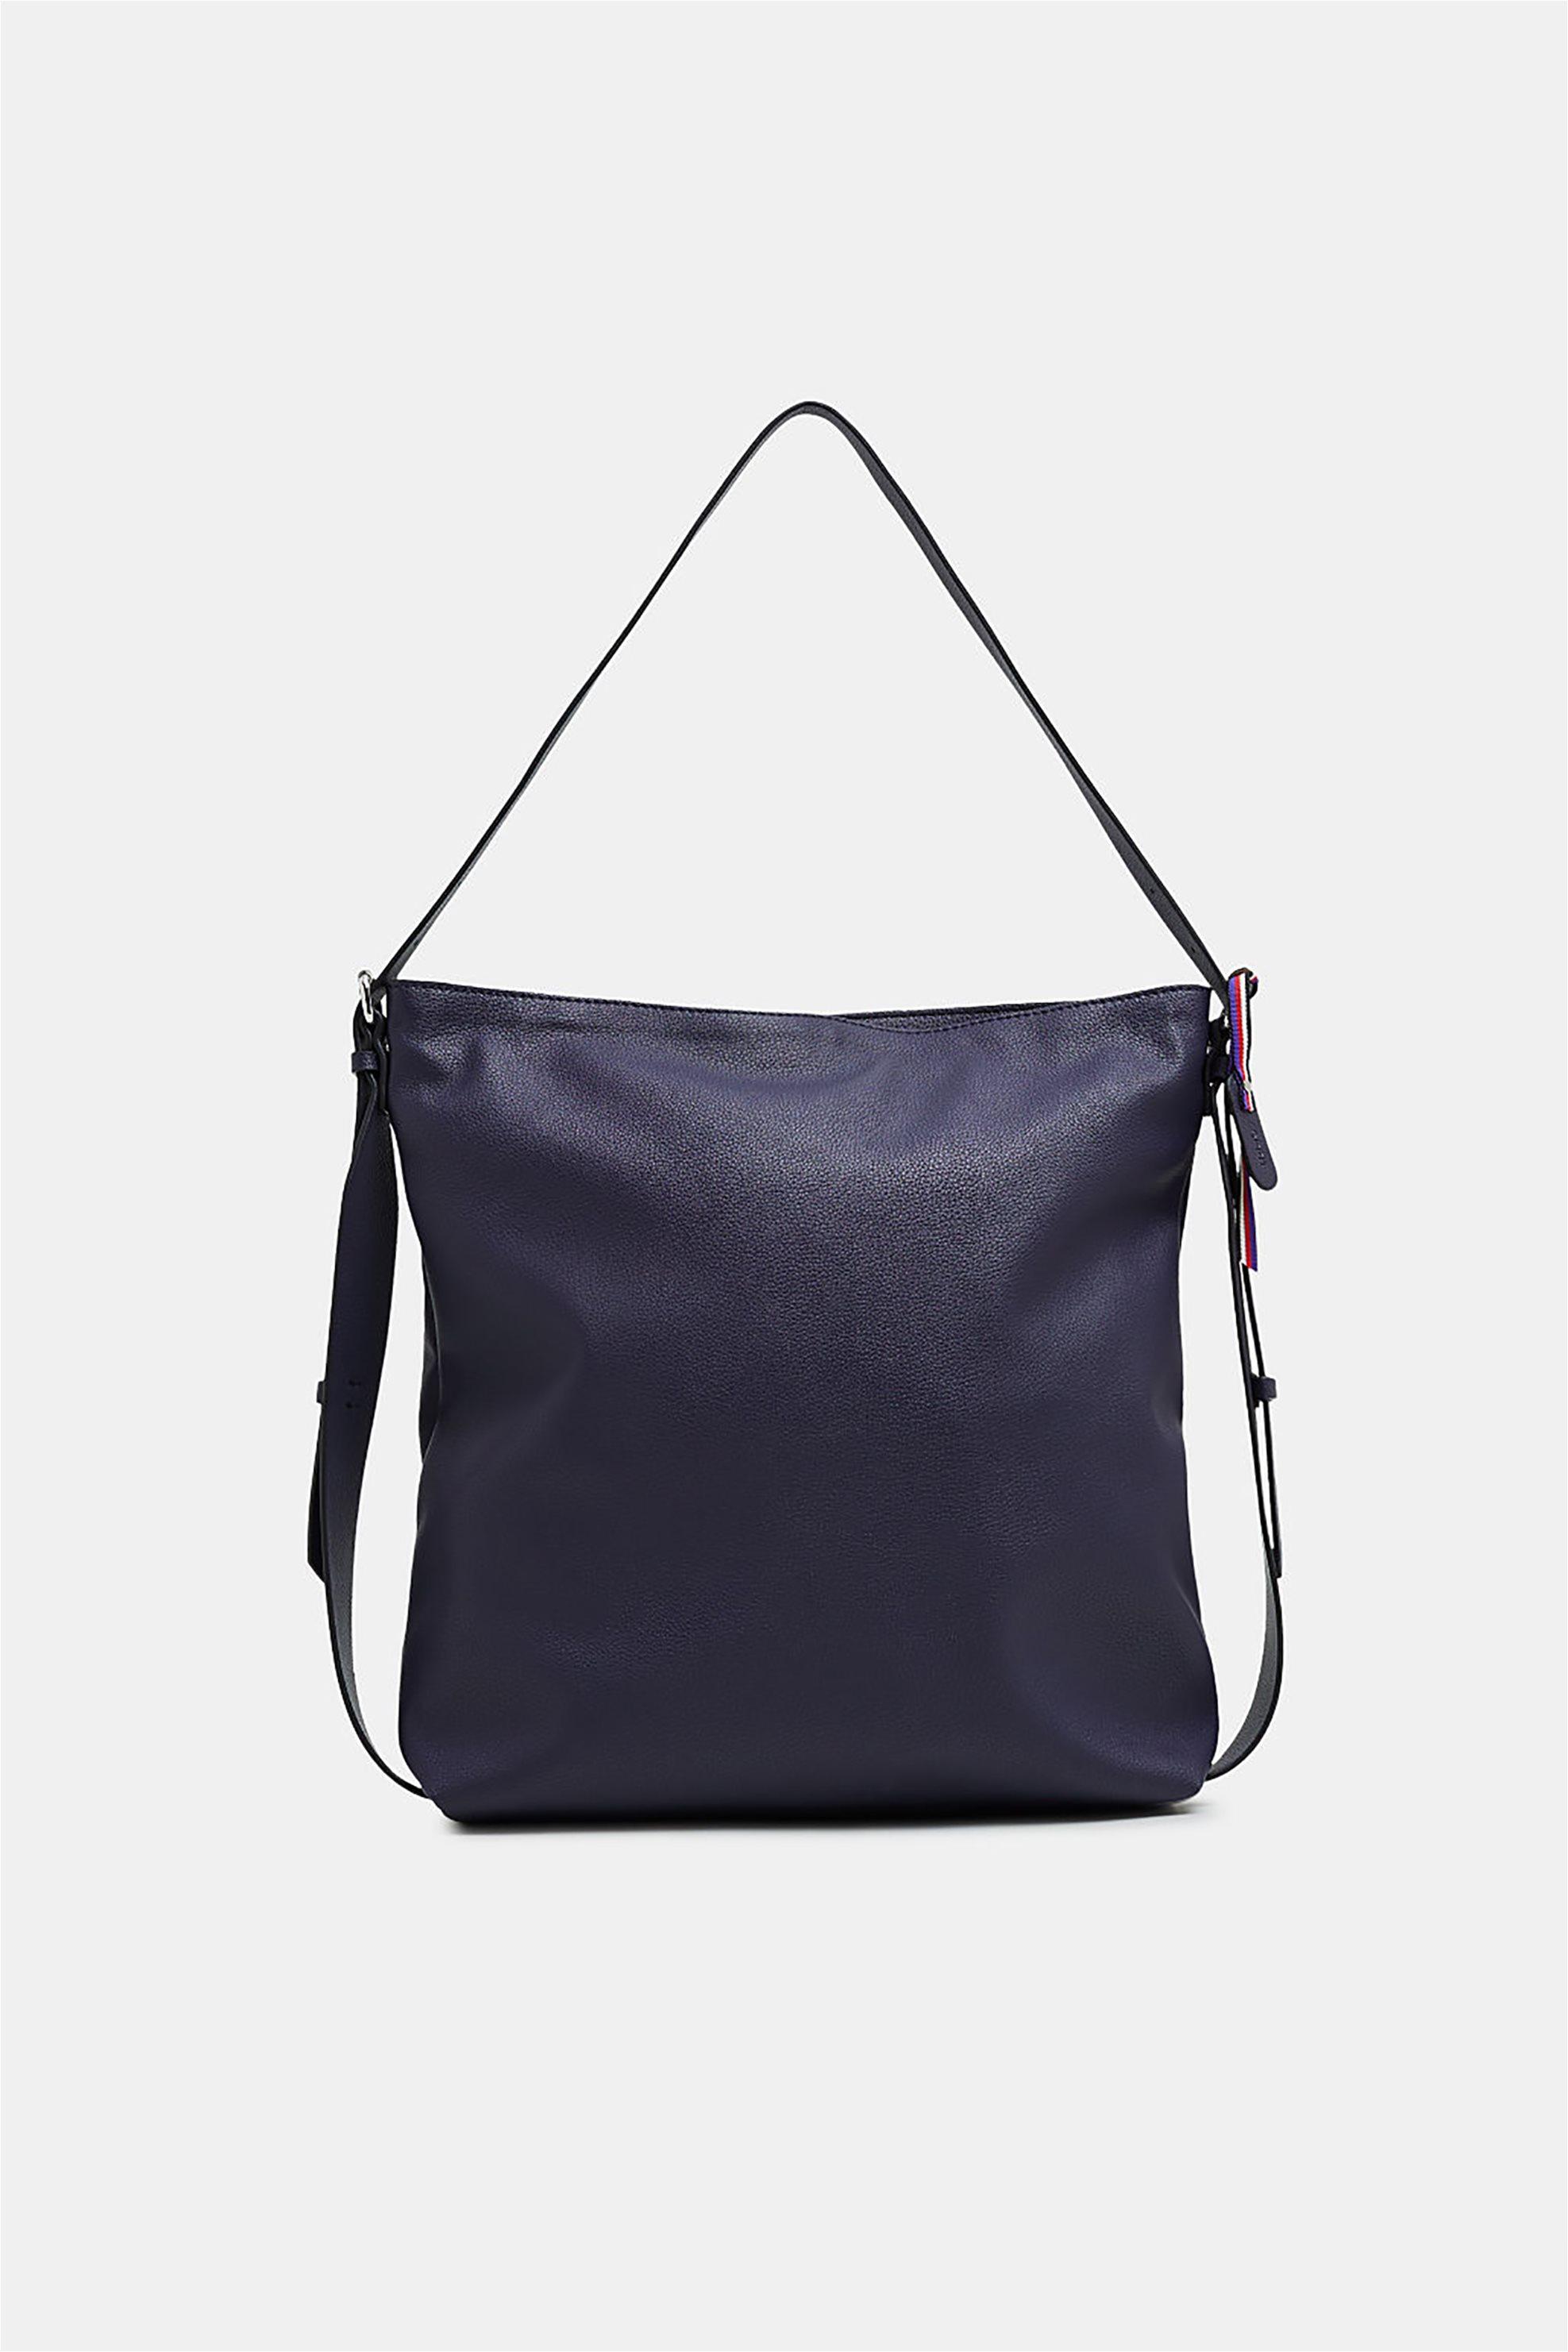 cb52bdd45e Esprit γυναικεία τσάντα ώμου με διακοσμητικές αγκράφες - 128EA1O007 - Μπλε  Σκούρο